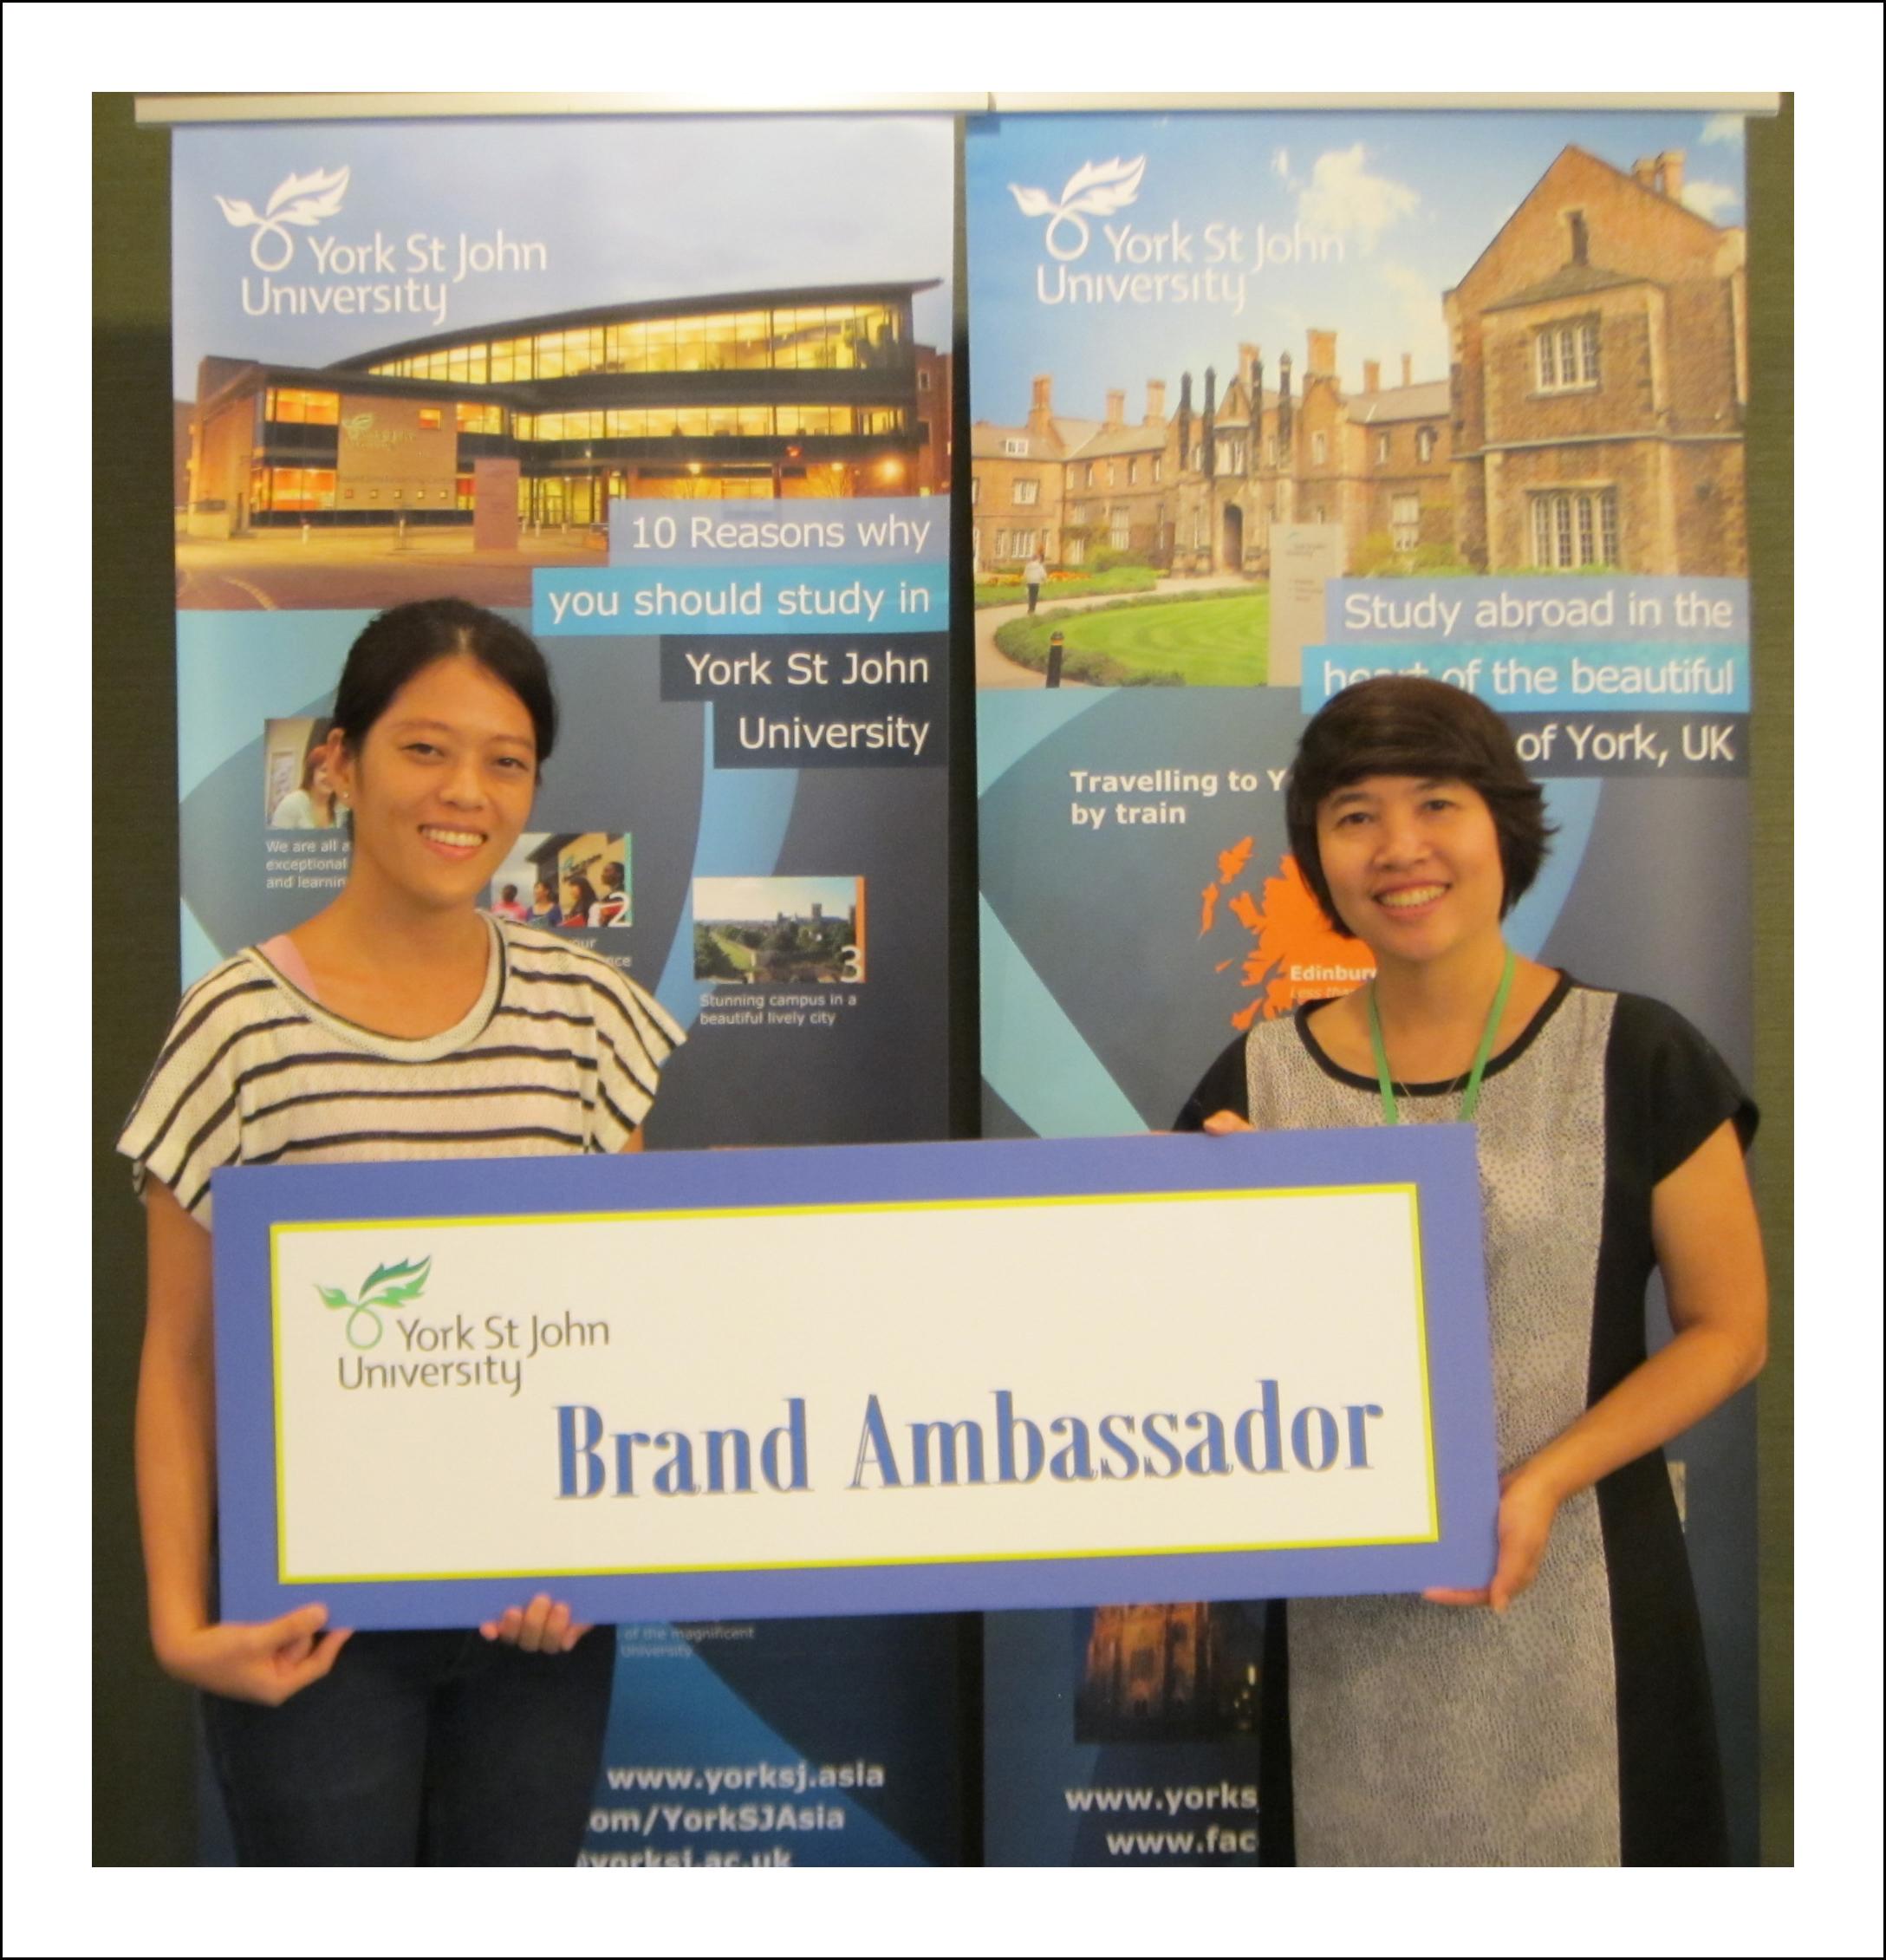 Thailand Brand Ambassador, York St John University